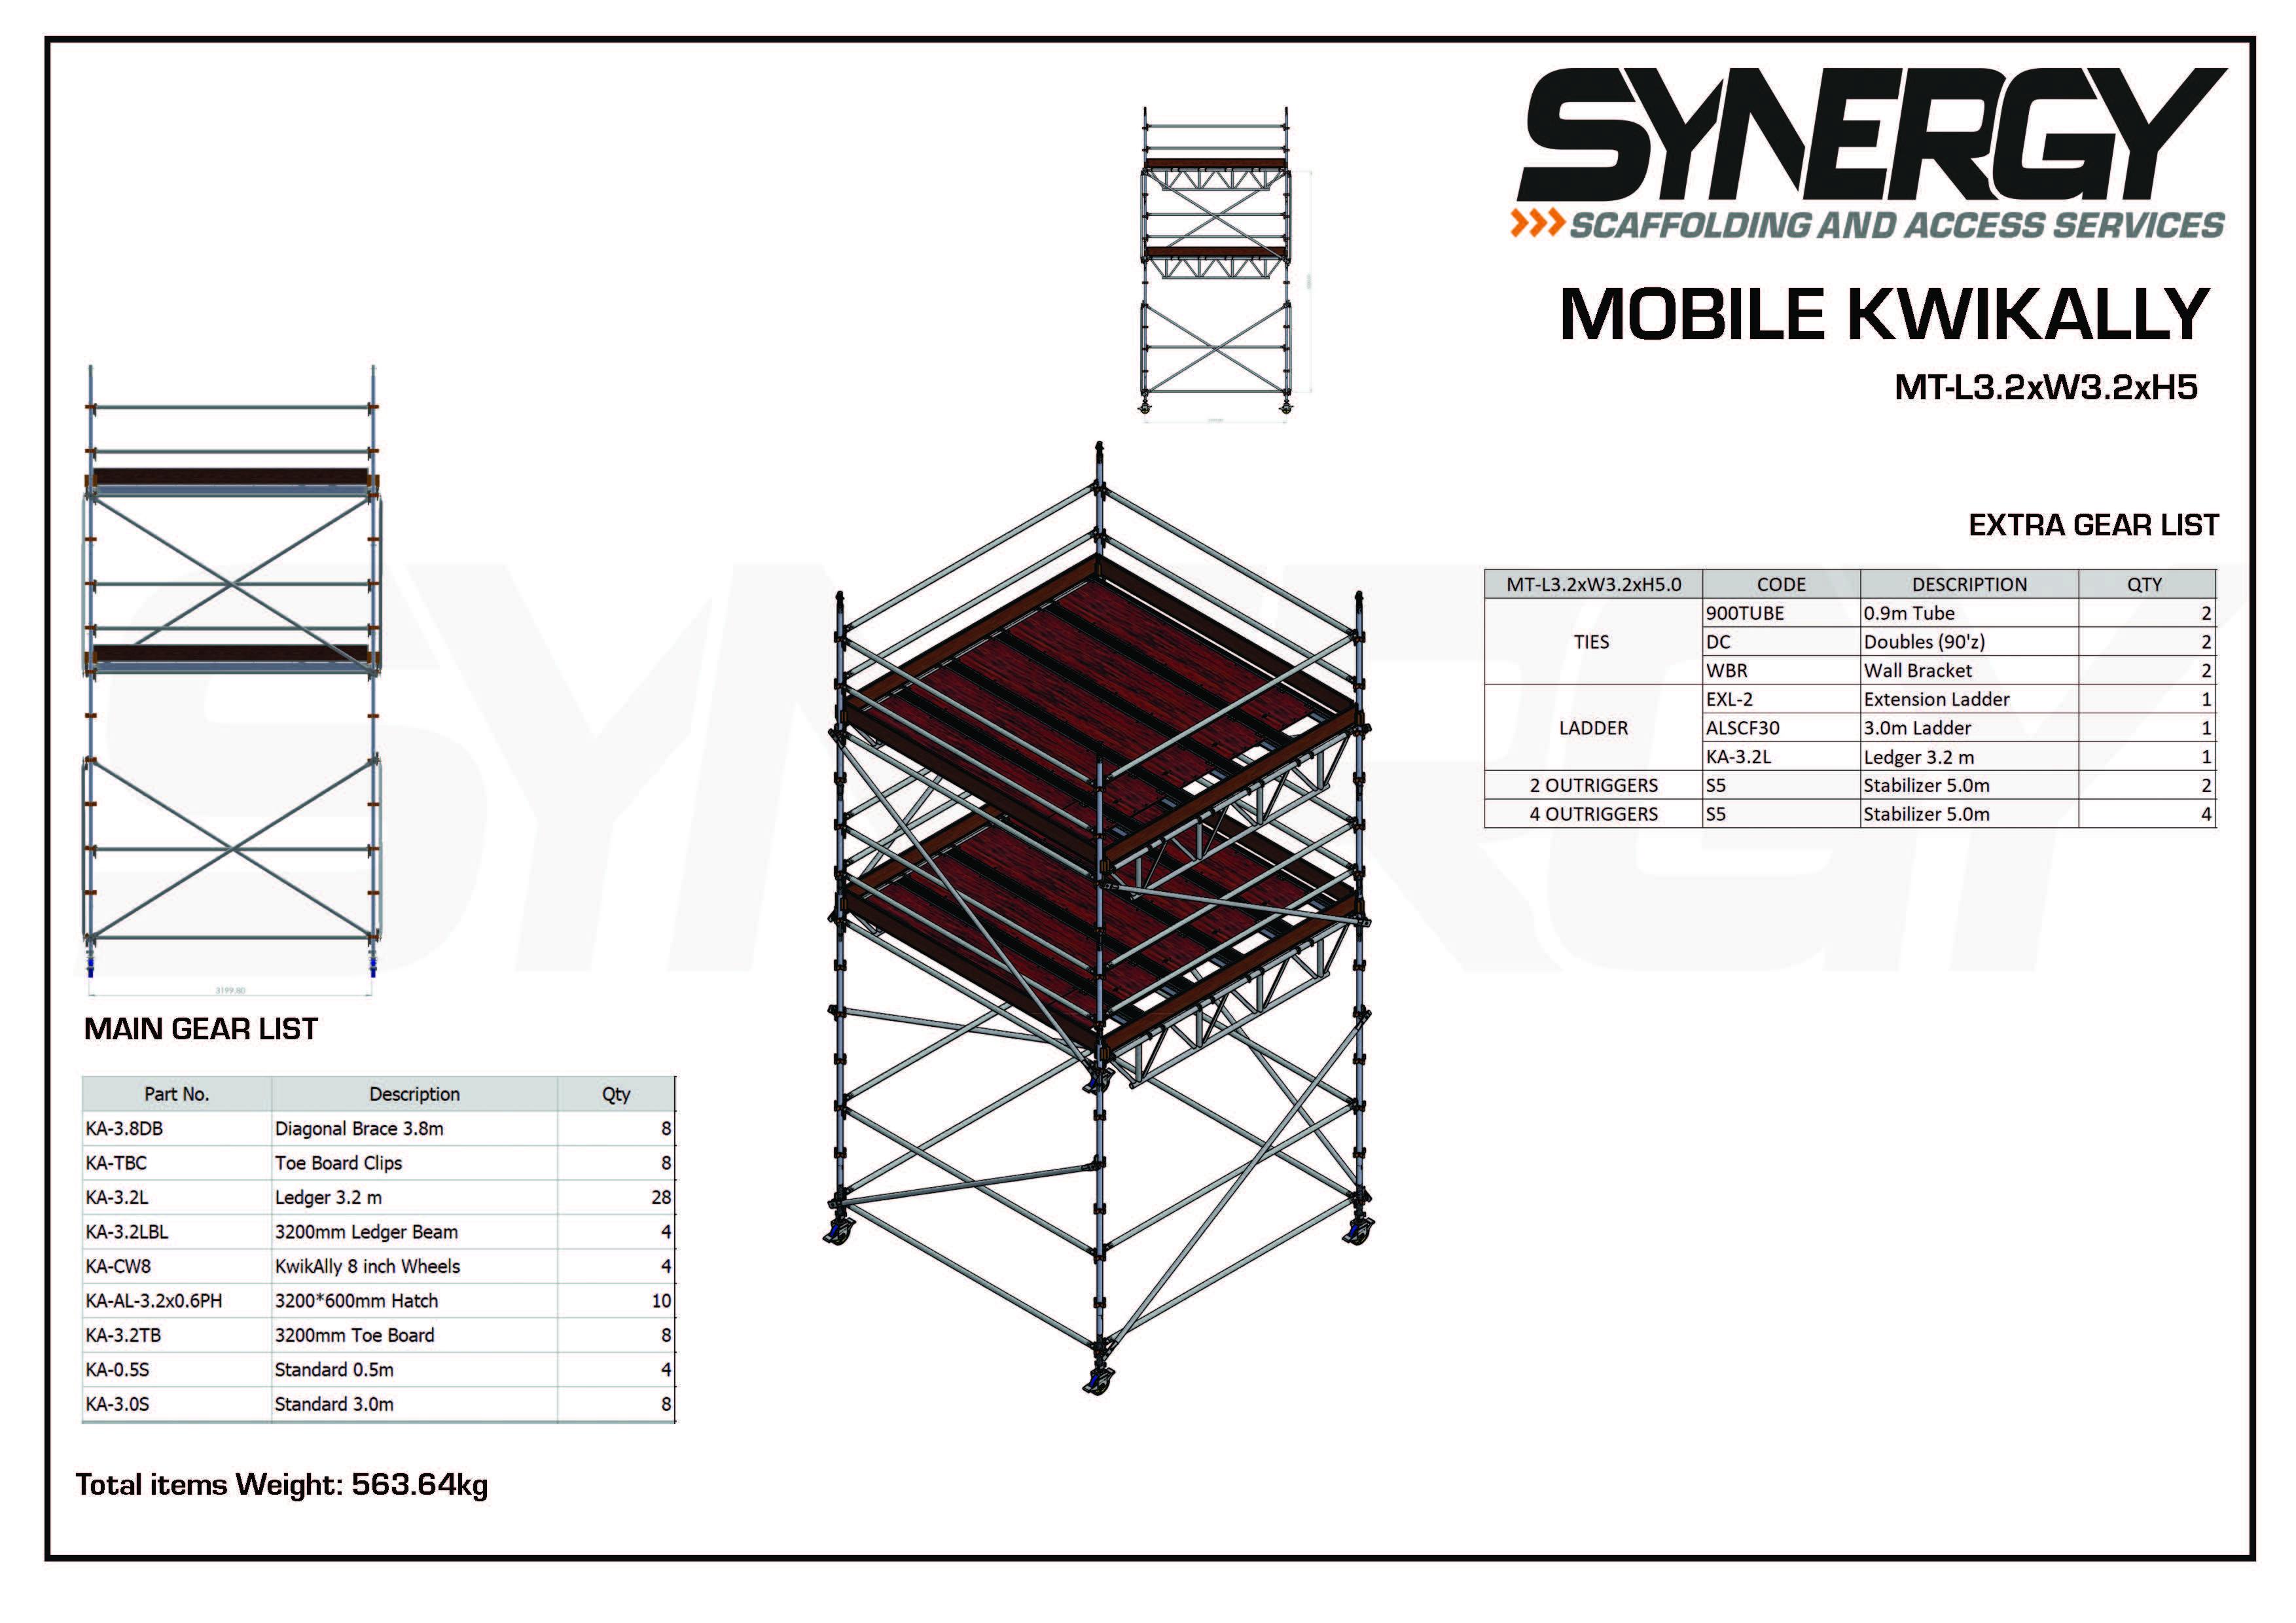 Kwikally Mobile 3.2m x 3.2m x 5m(Height)